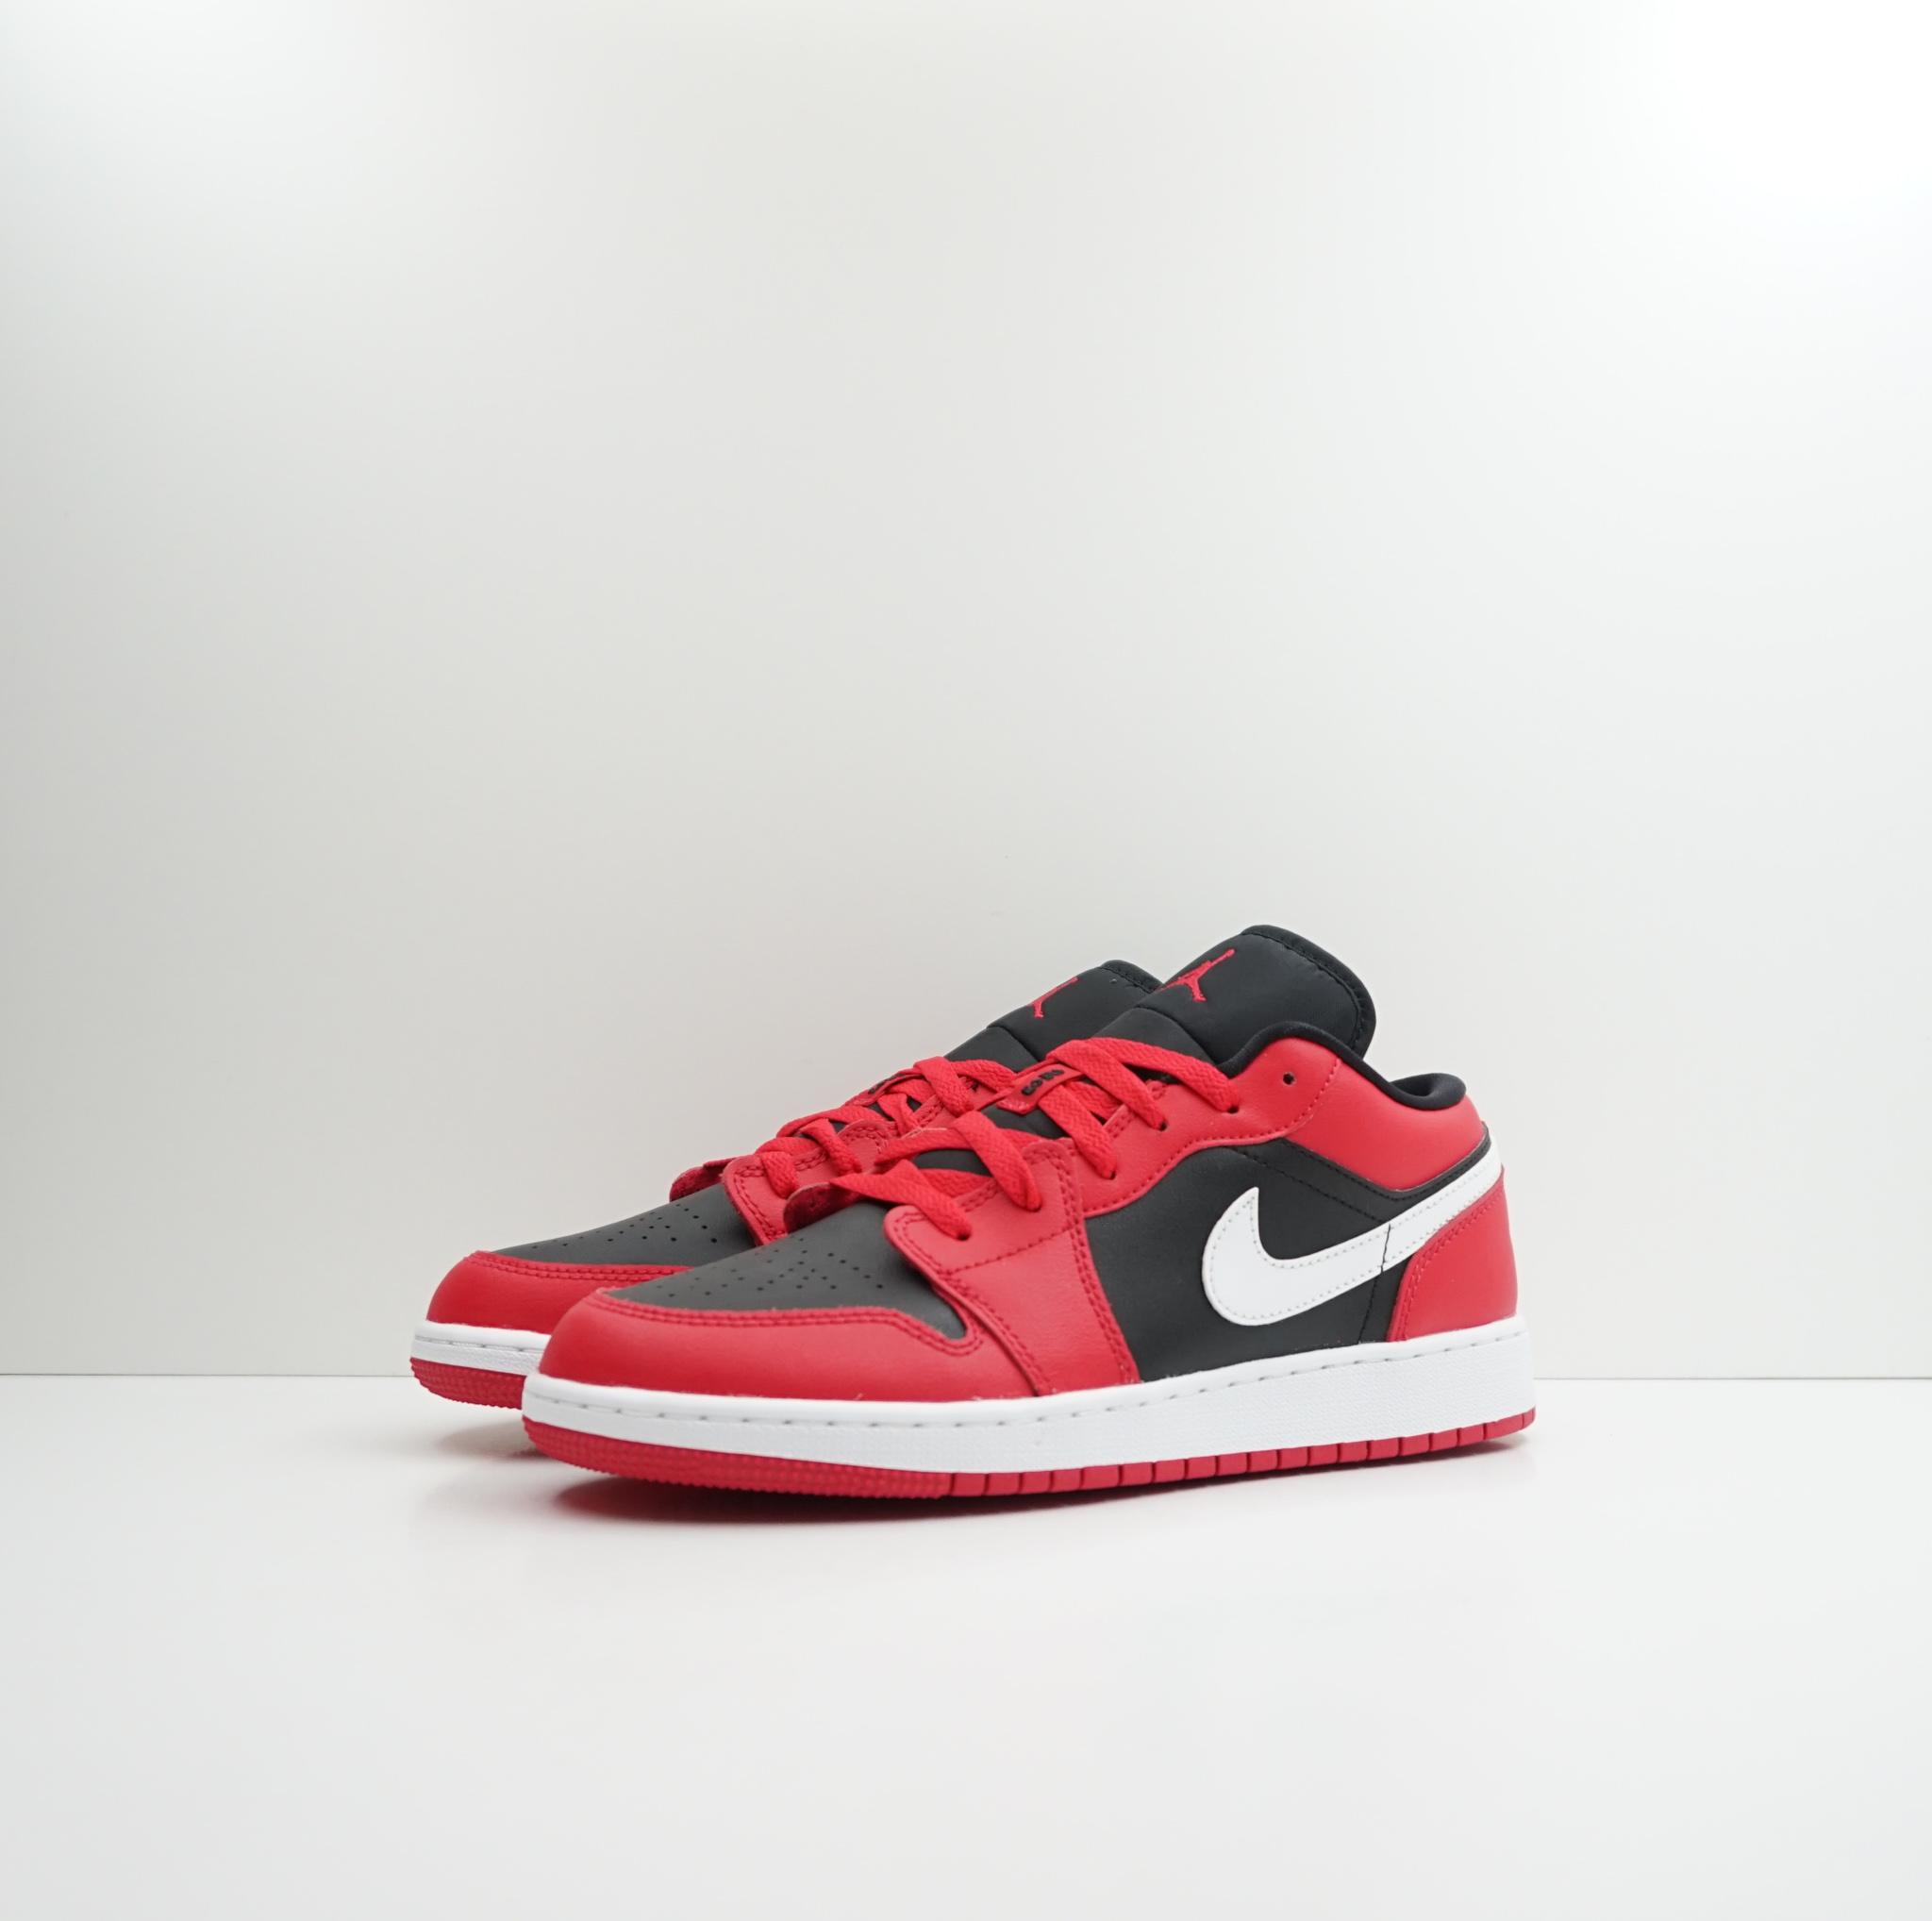 Jordan 1 Low Black Very Berry (GS)